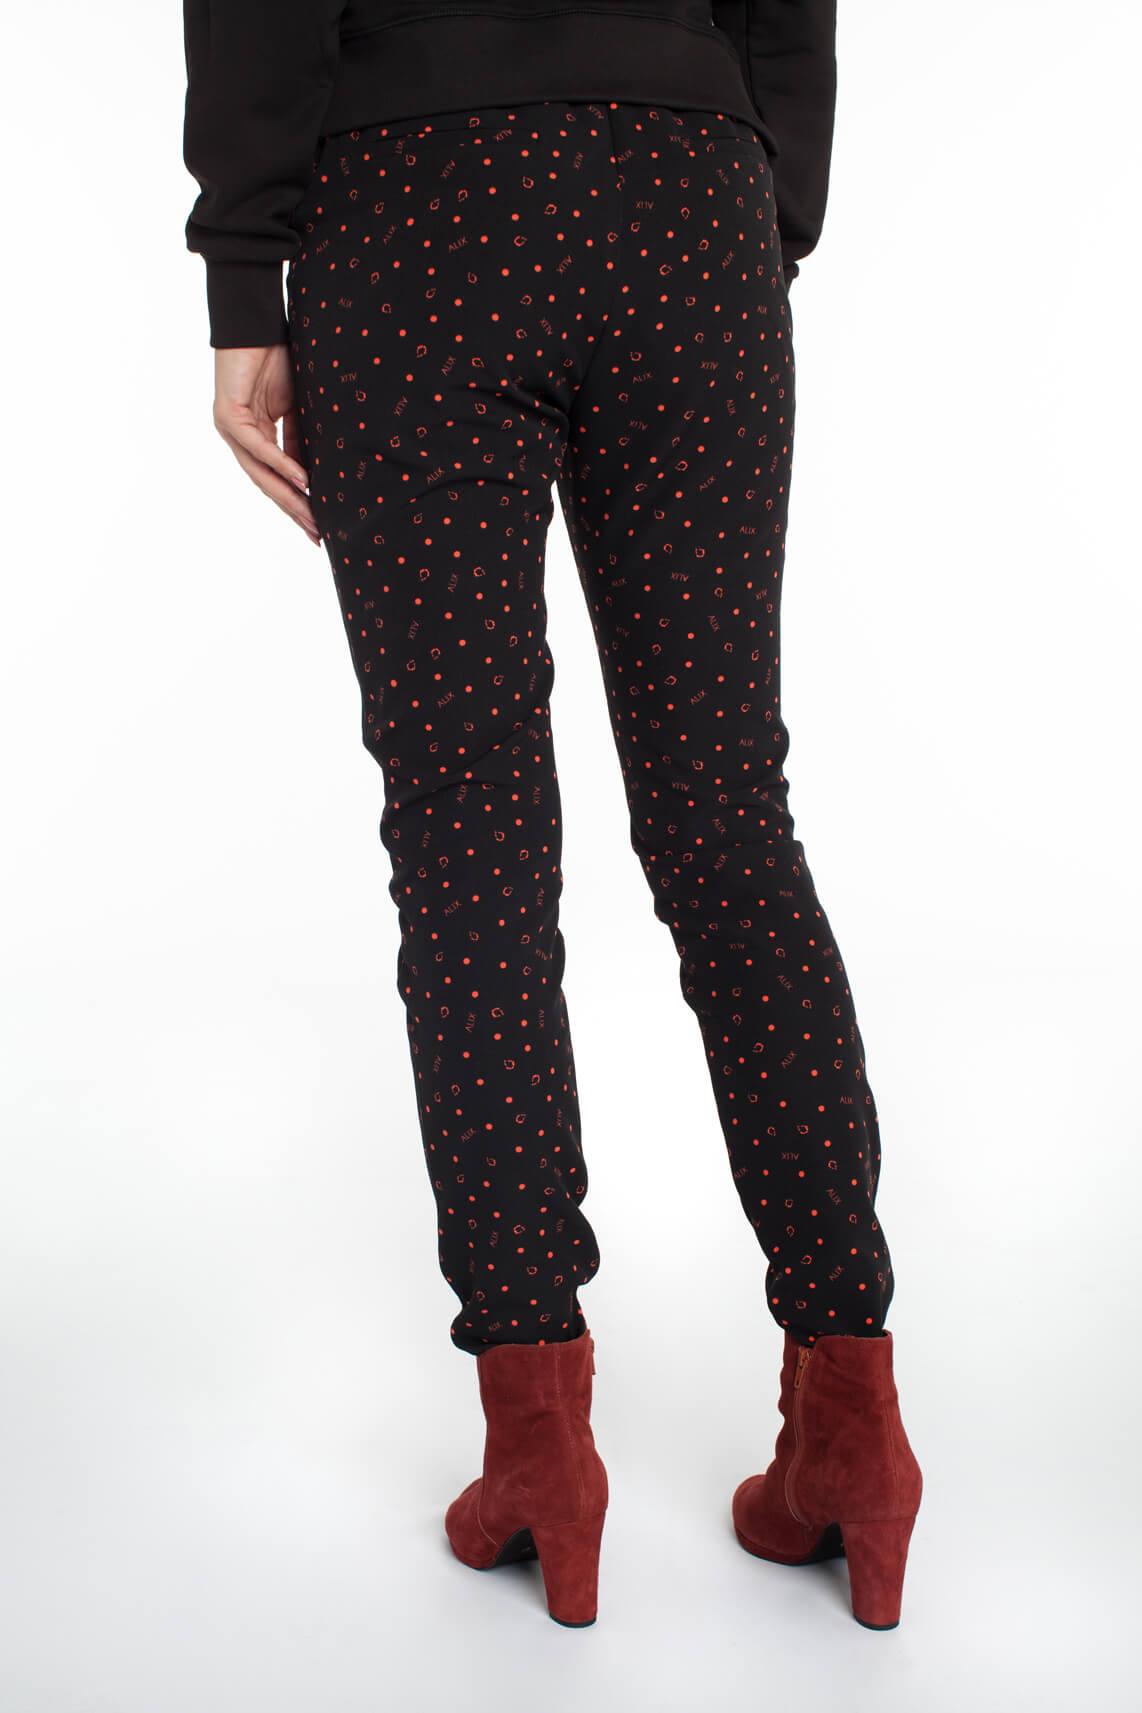 Alix The Label Dames Pantalon met print zwart